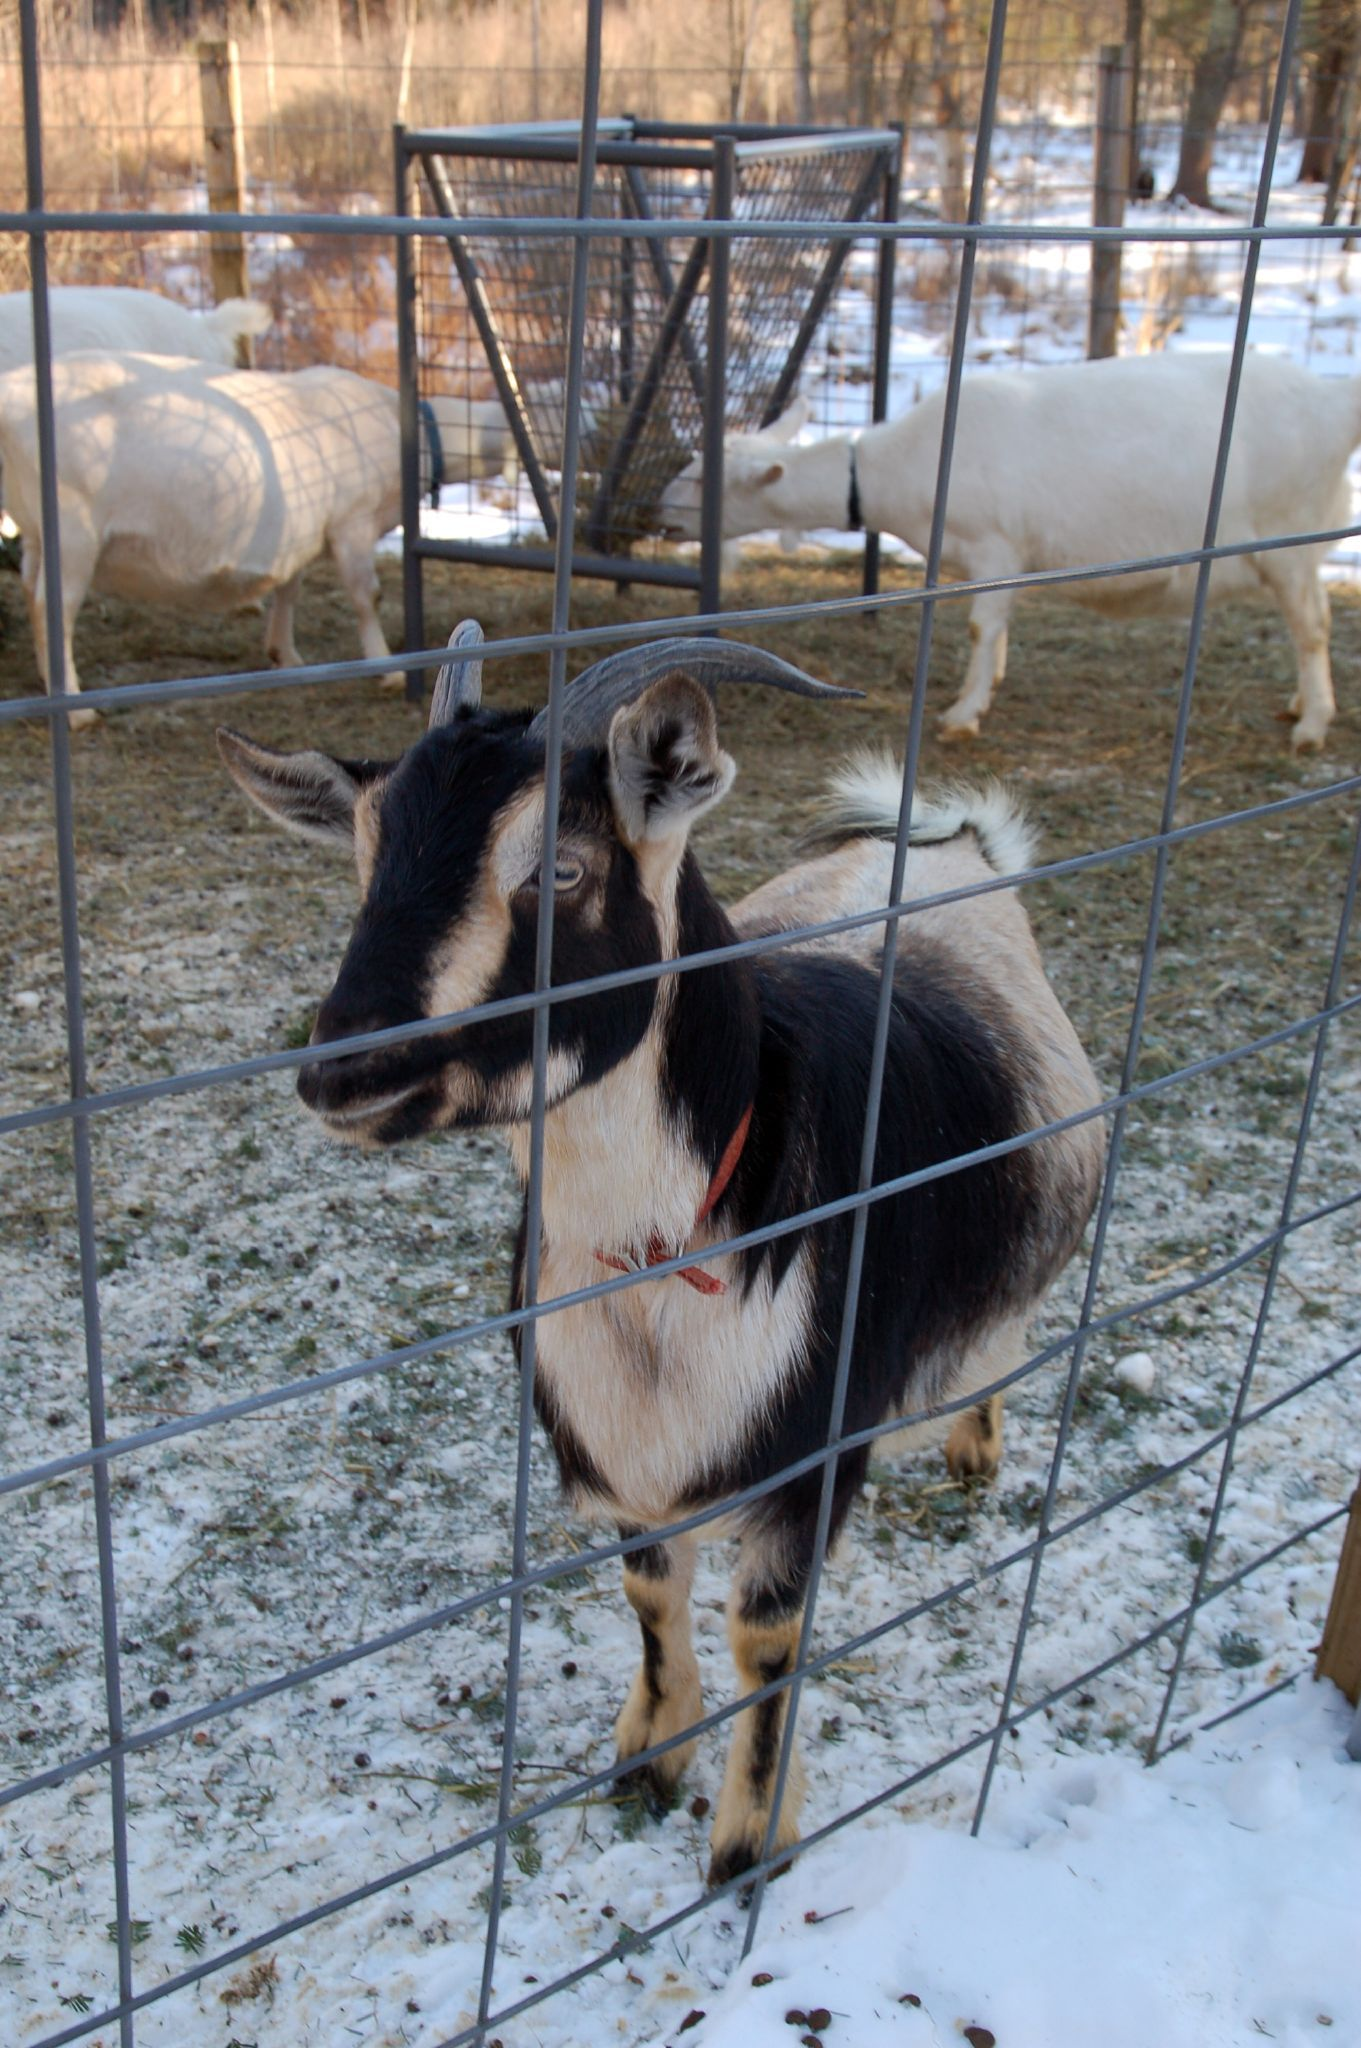 An Arapawa dairy goat, from New Zealand. Goats, Dwarf